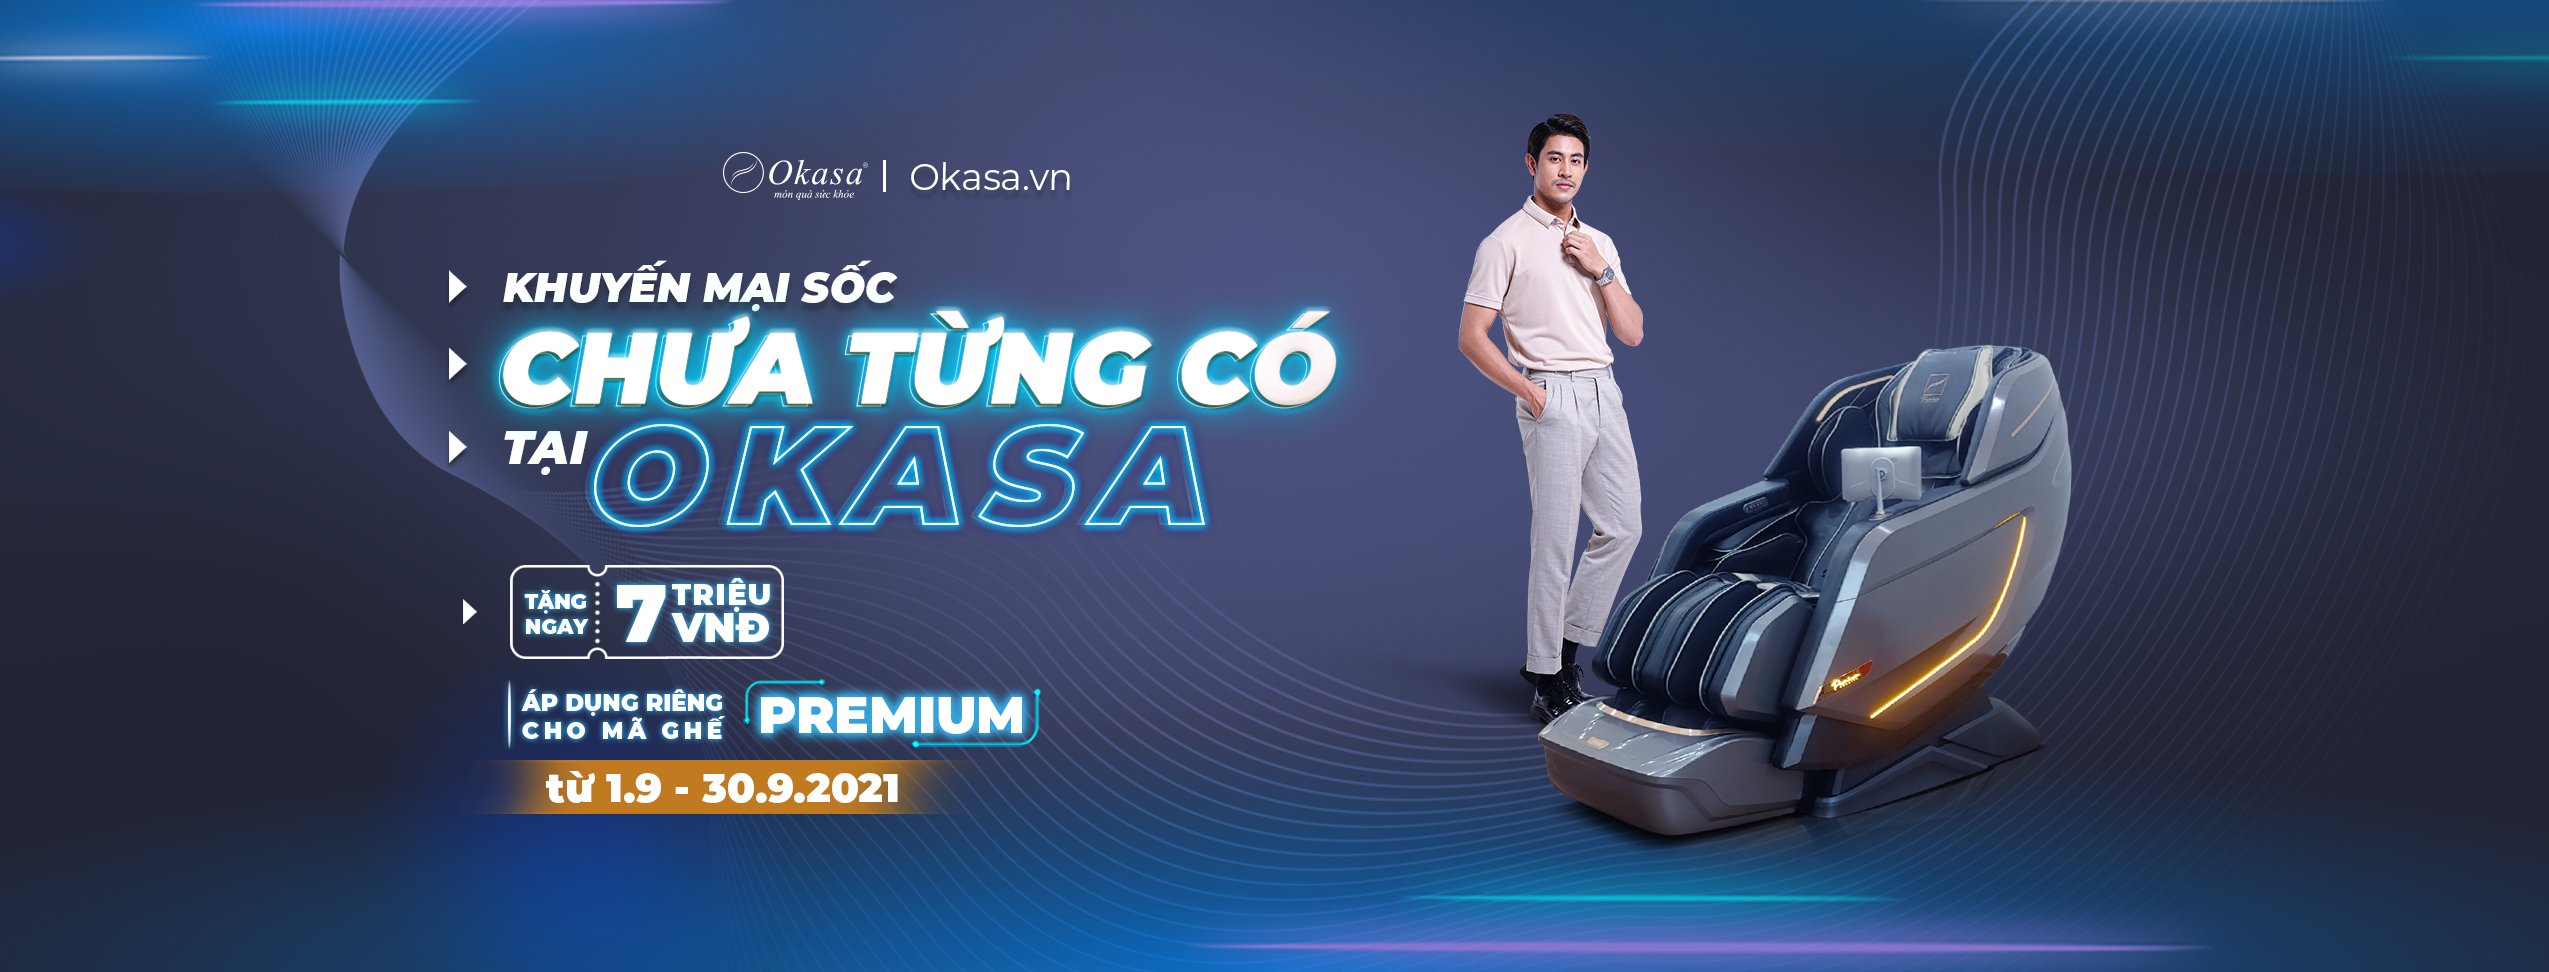 Tiết kiệm 7 triệu đồng khi mua ghế massage Premium